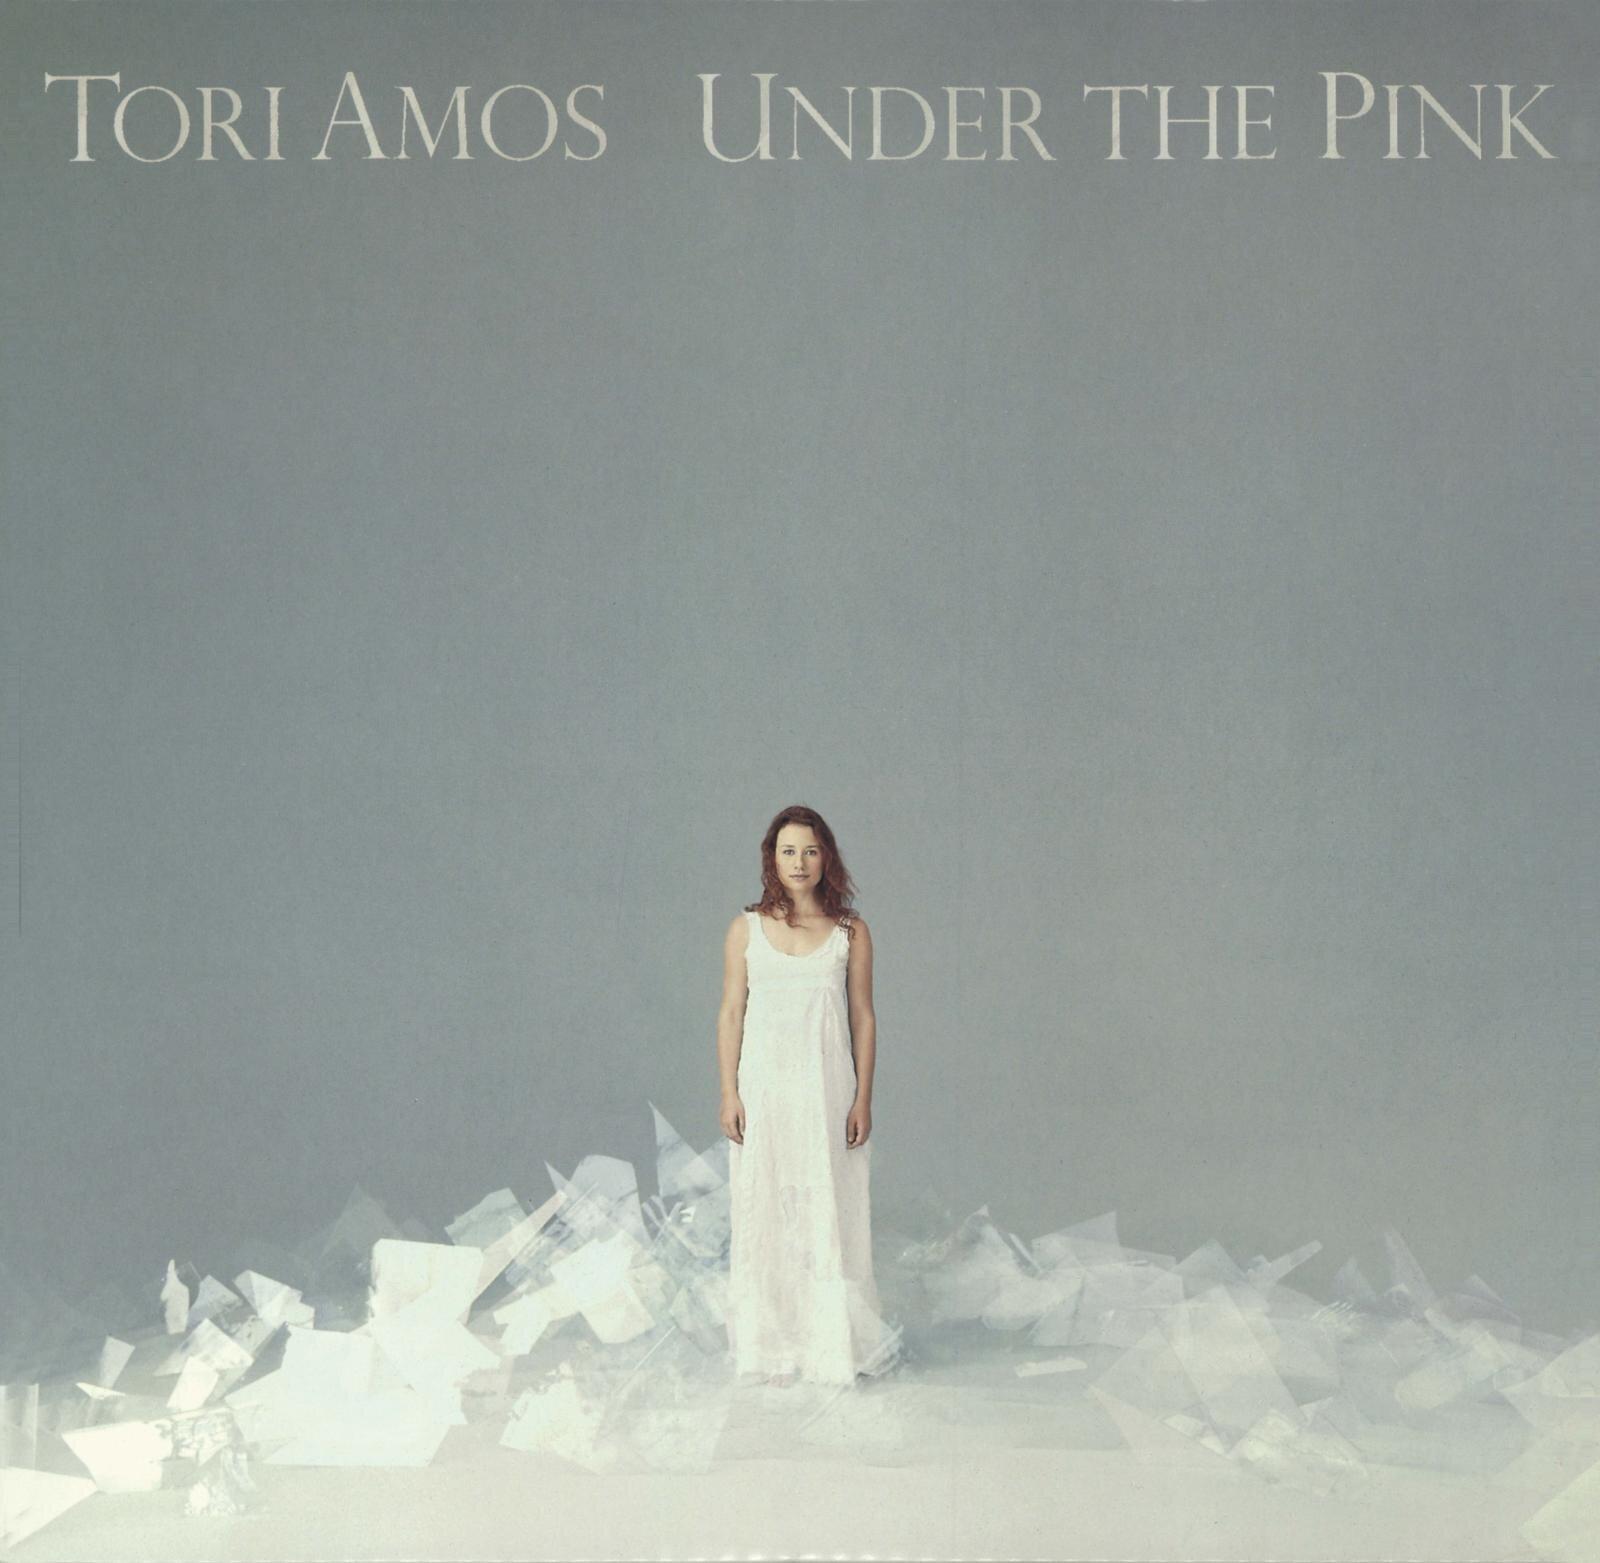 Виниловая пластинка Tori Amos - Under The Pink (Limited 180 Gram Transparent Pink Vinyl)